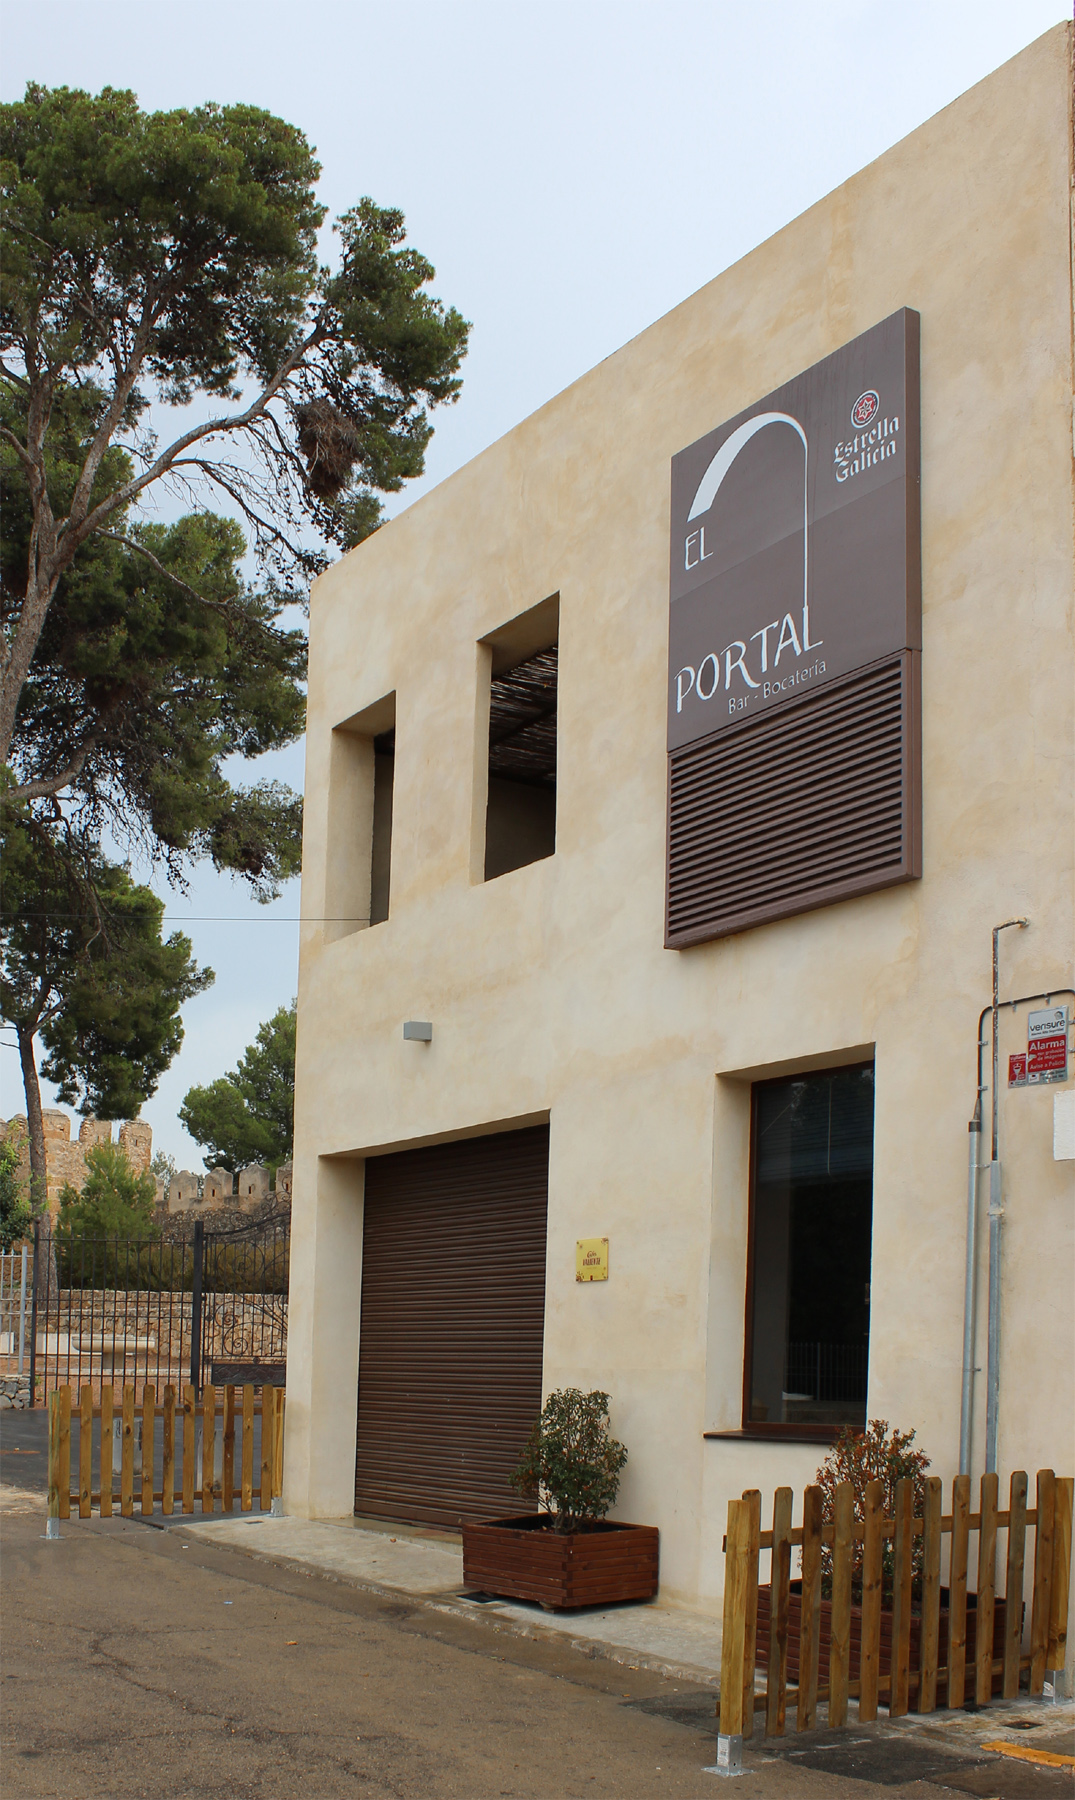 Ampliaci n de vivienda en benisan el portal santiago for Piscina cubierta lliria